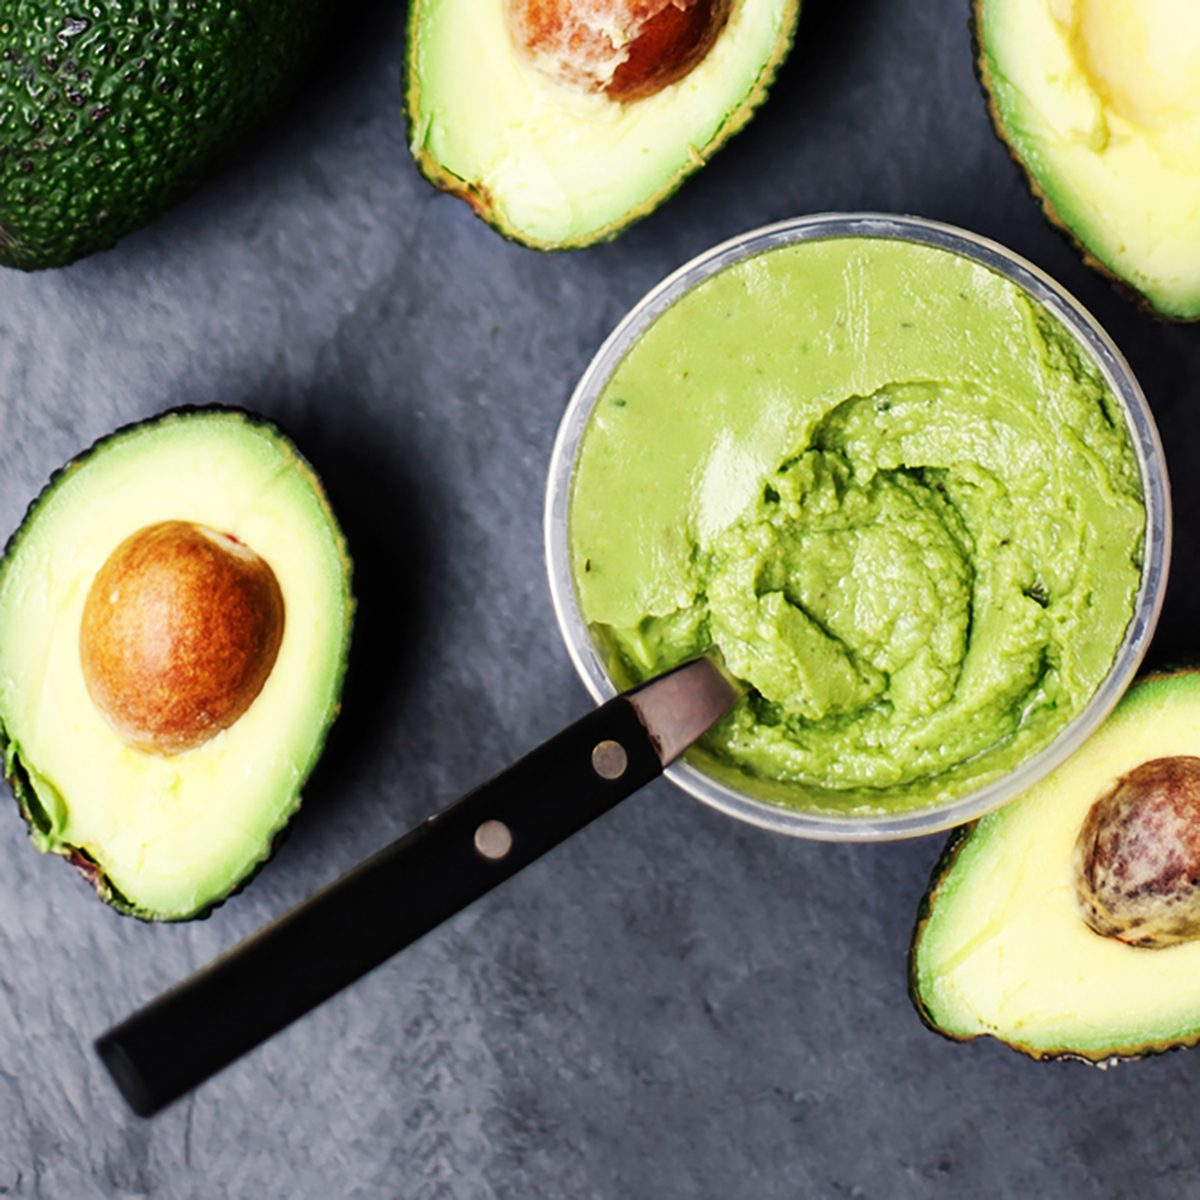 Guacamole. Avocado on a black background,